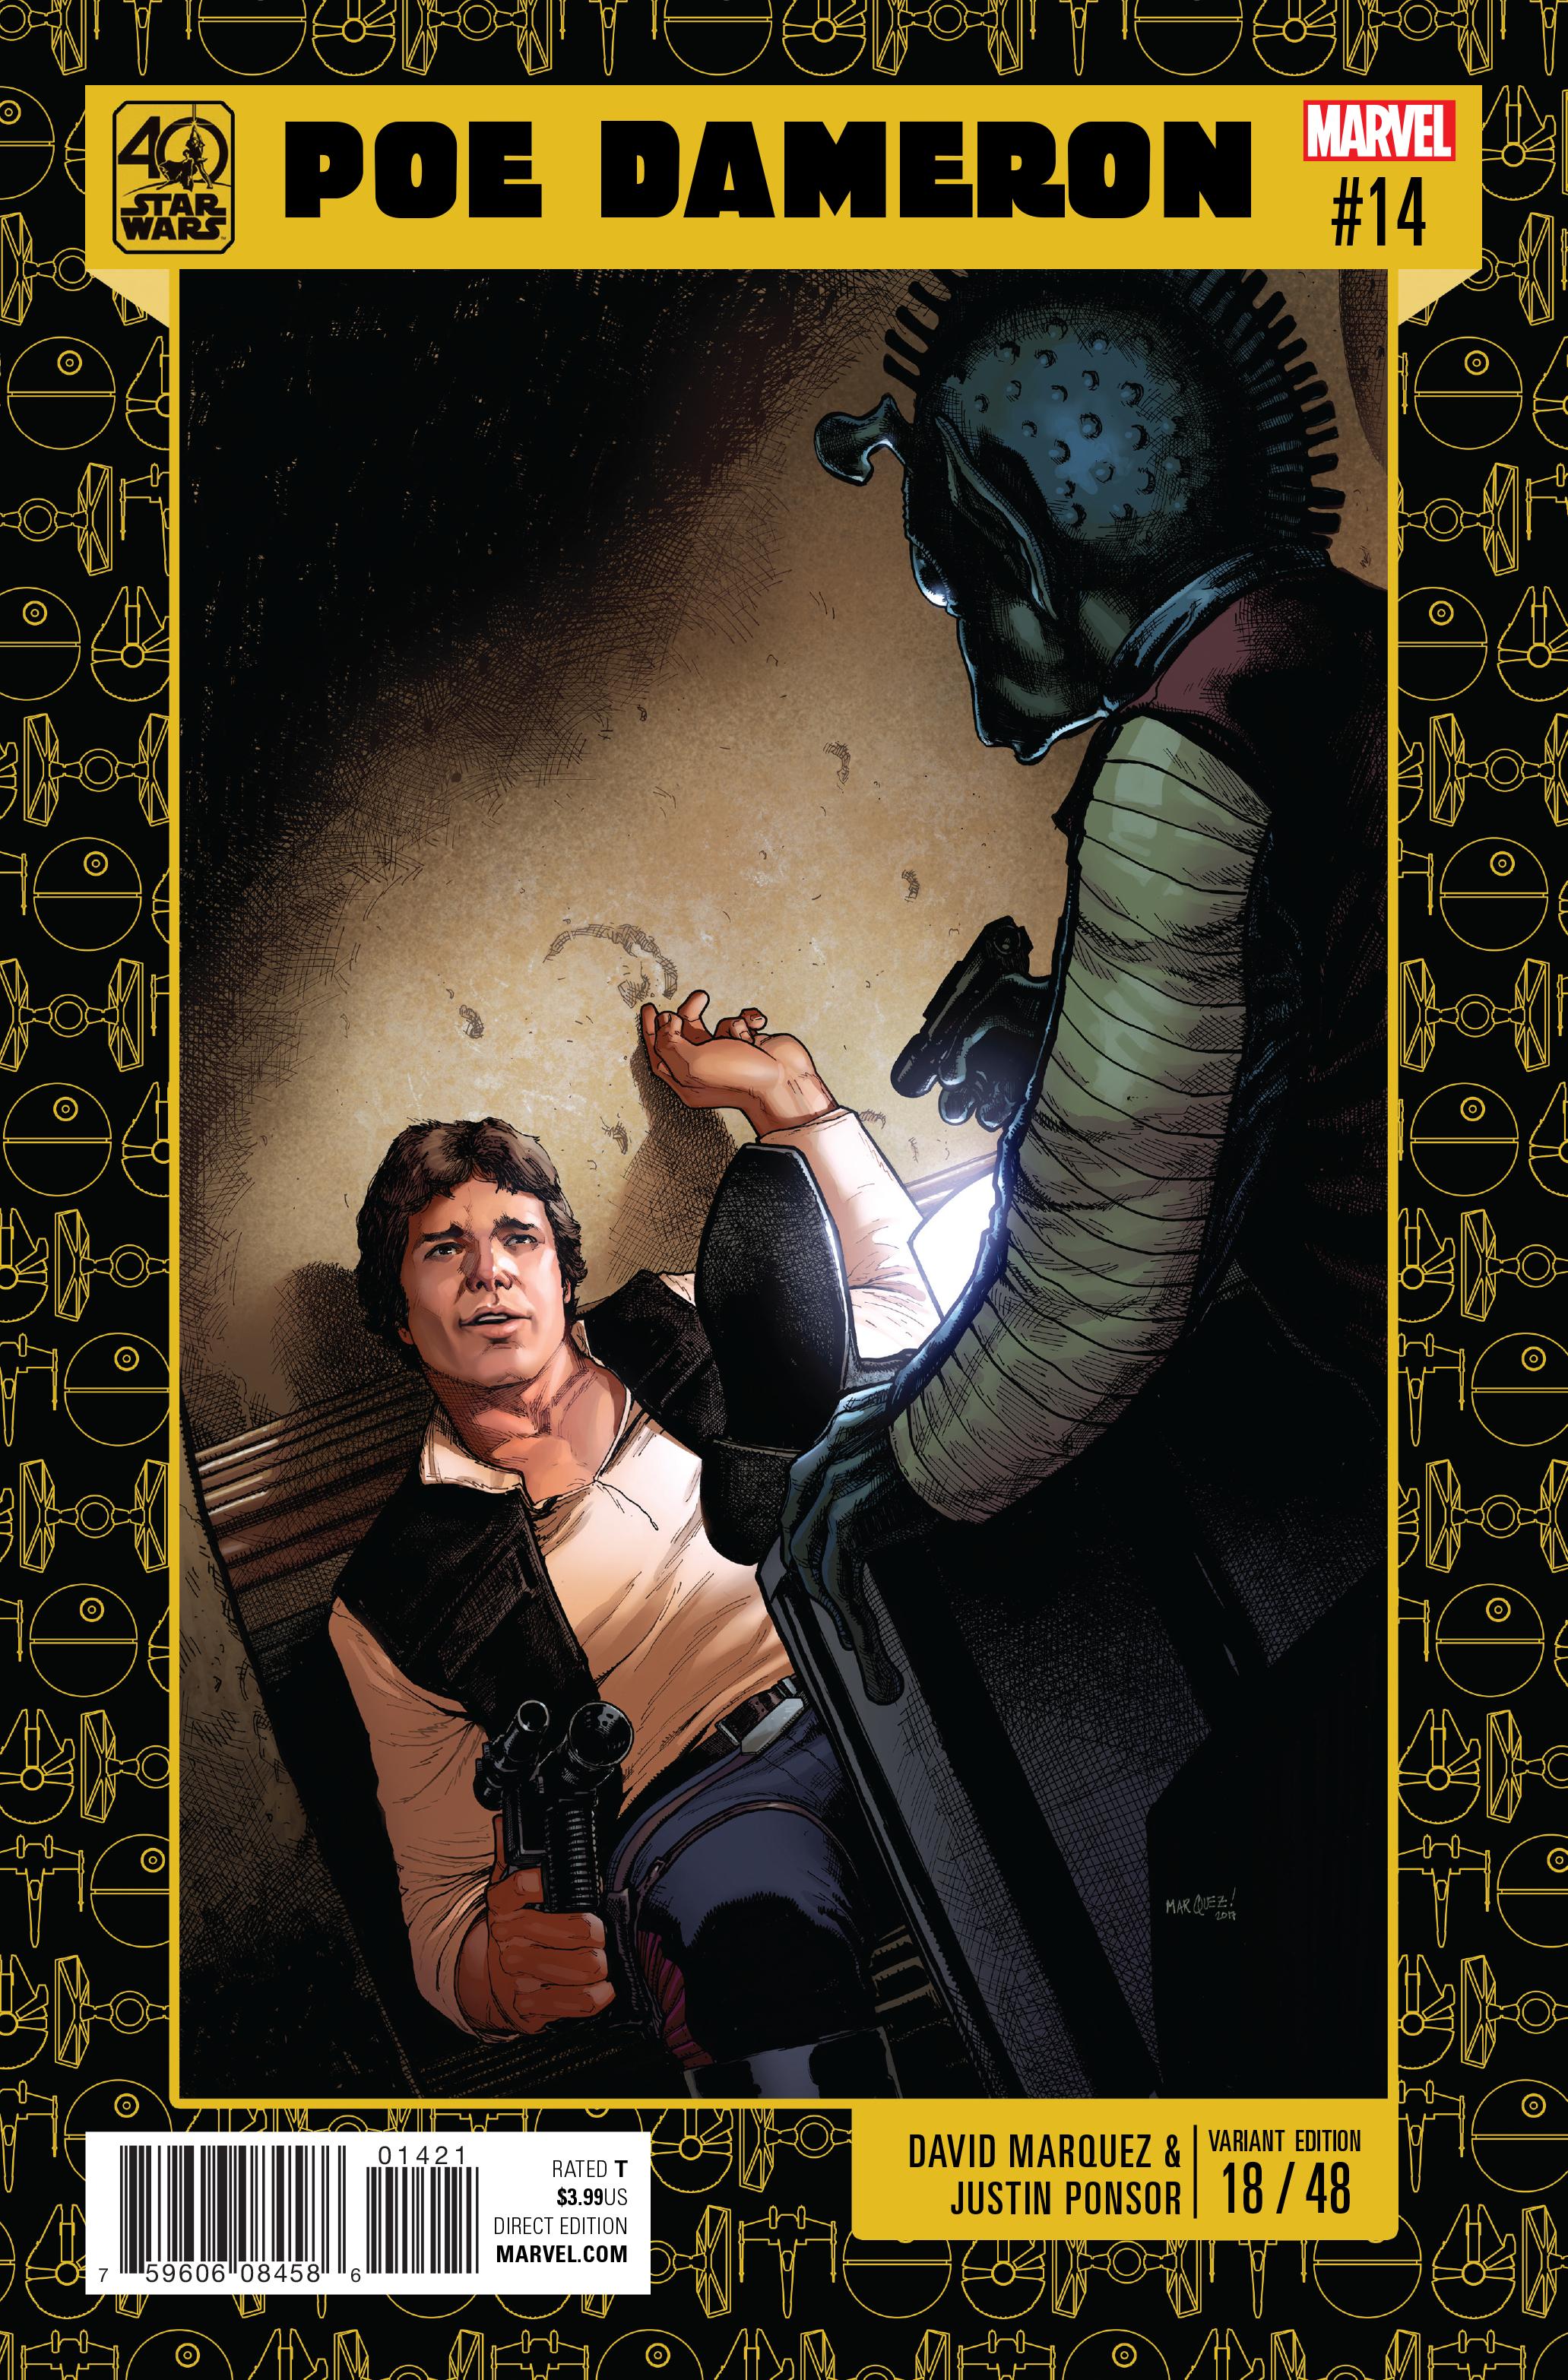 Poe Dameron #14 (David Marquez Star Wars 40th Anniversary Variant Cover) (03.05.2017)